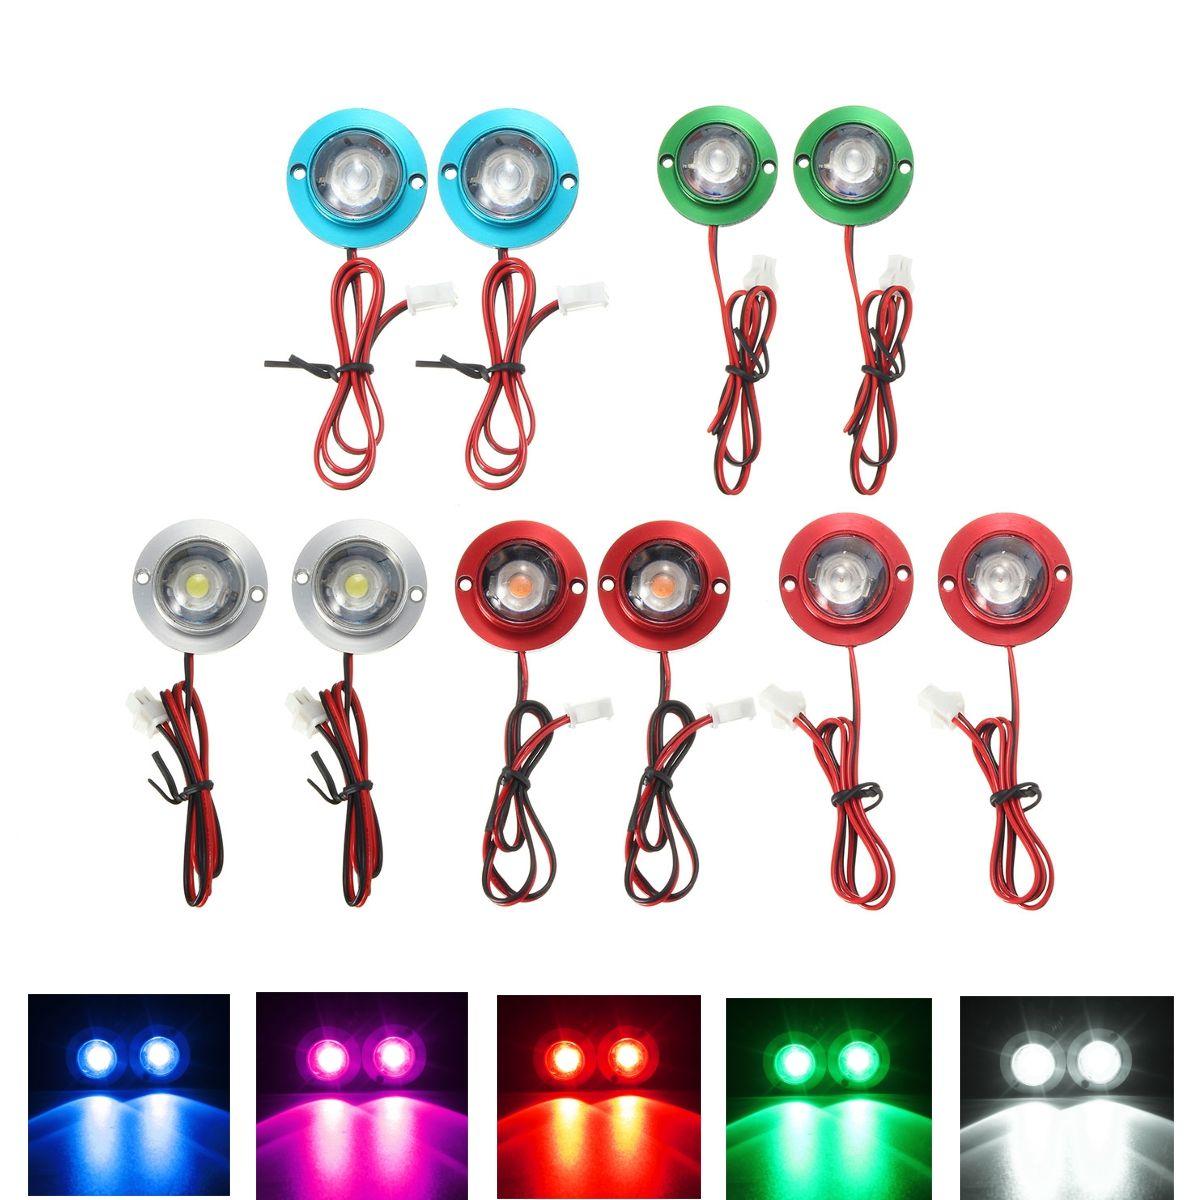 LED Flash estroboscópico de advertencia de emergencia